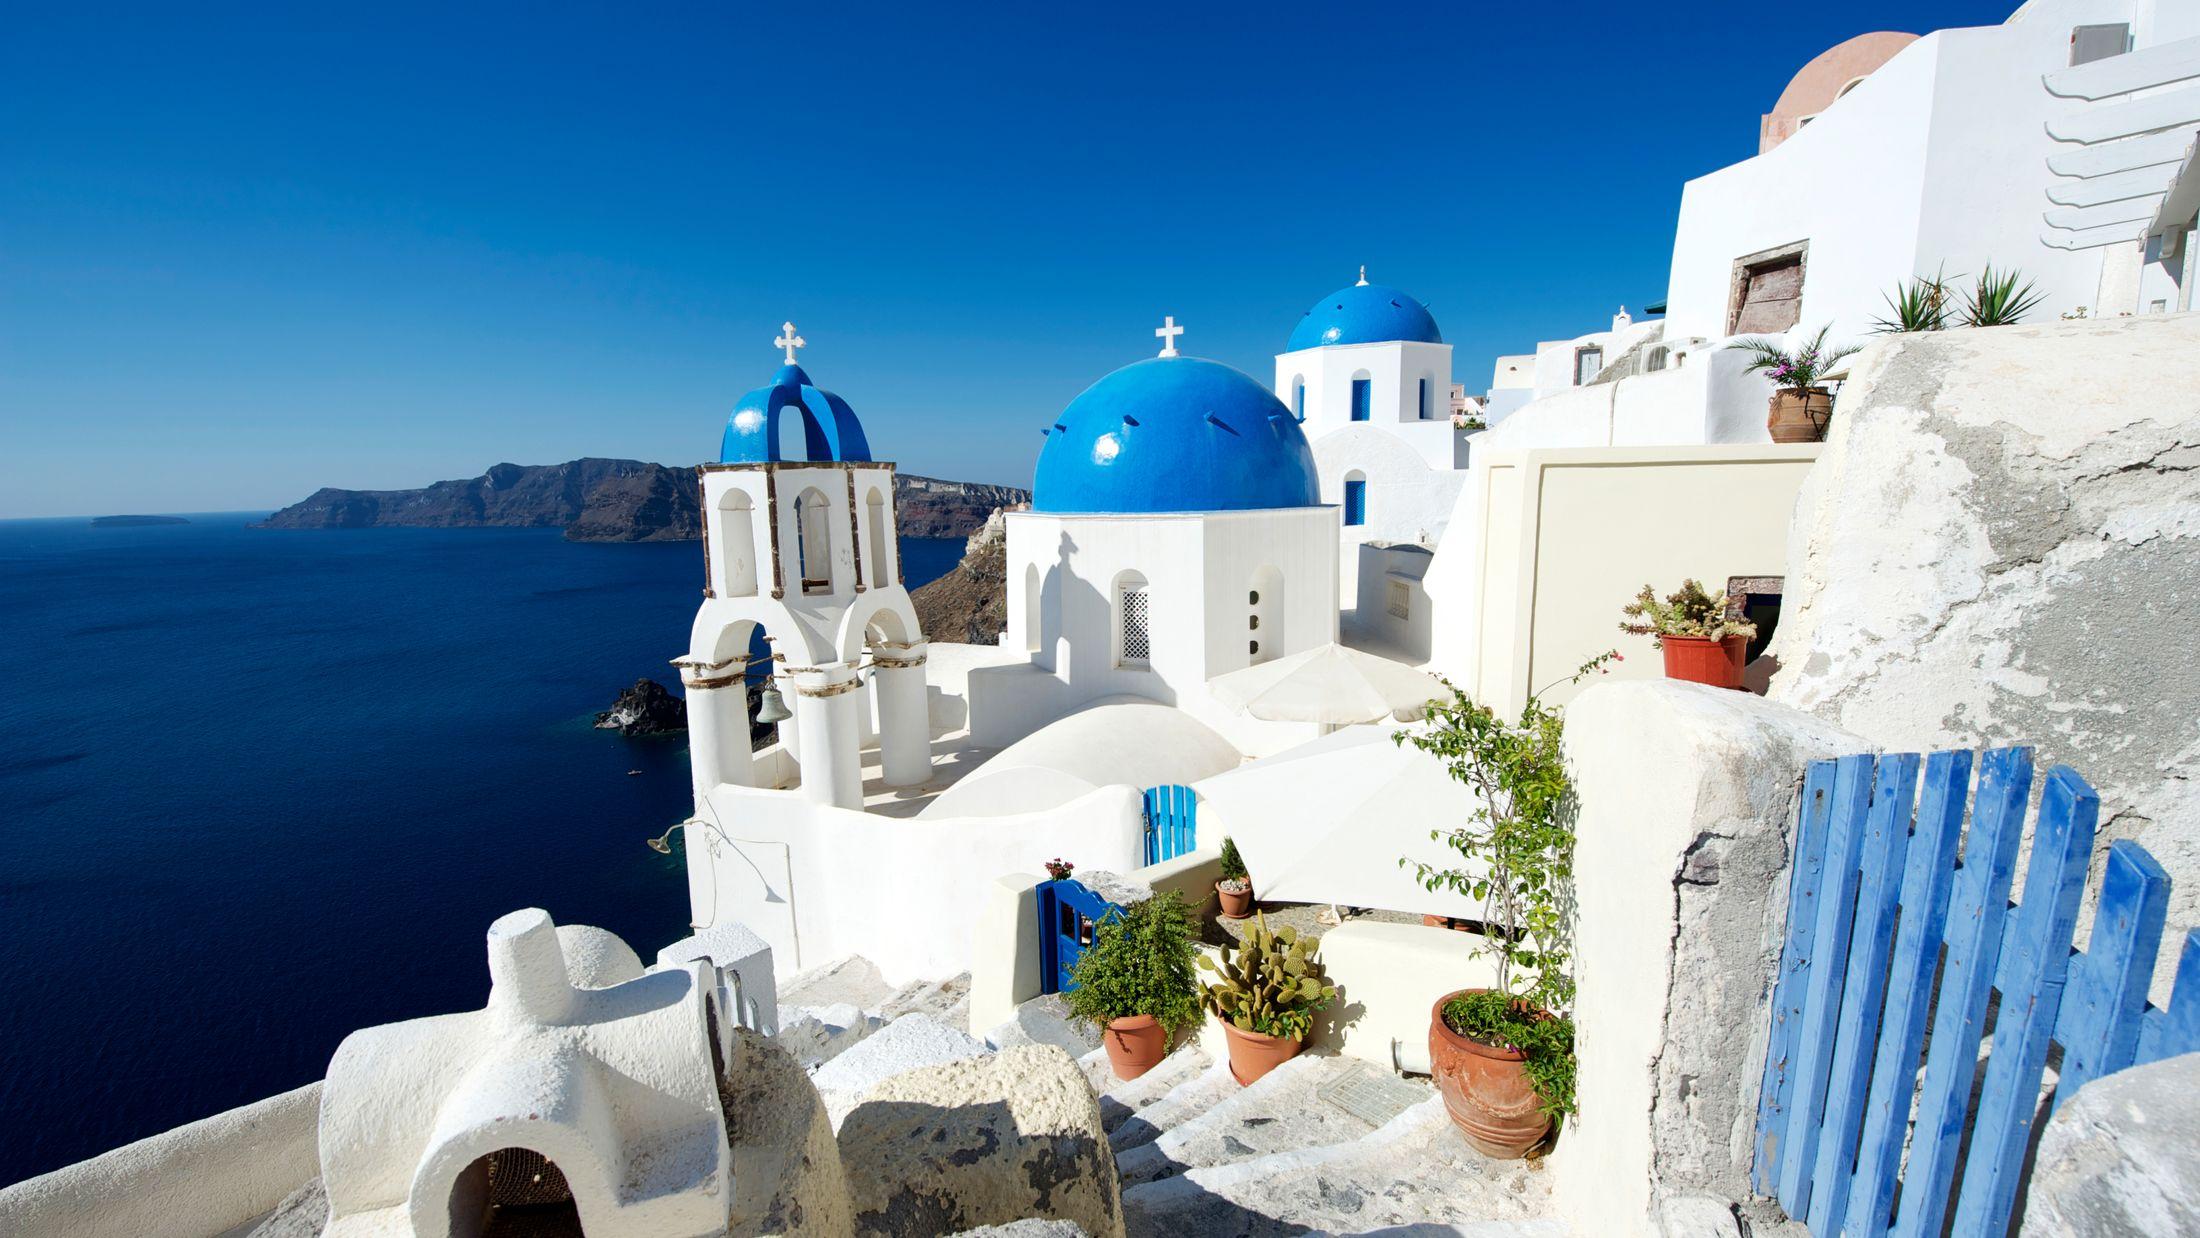 Best Island Beaches For Partying Mykonos St Barts: Luxury Santorini Holidays 2019/2020